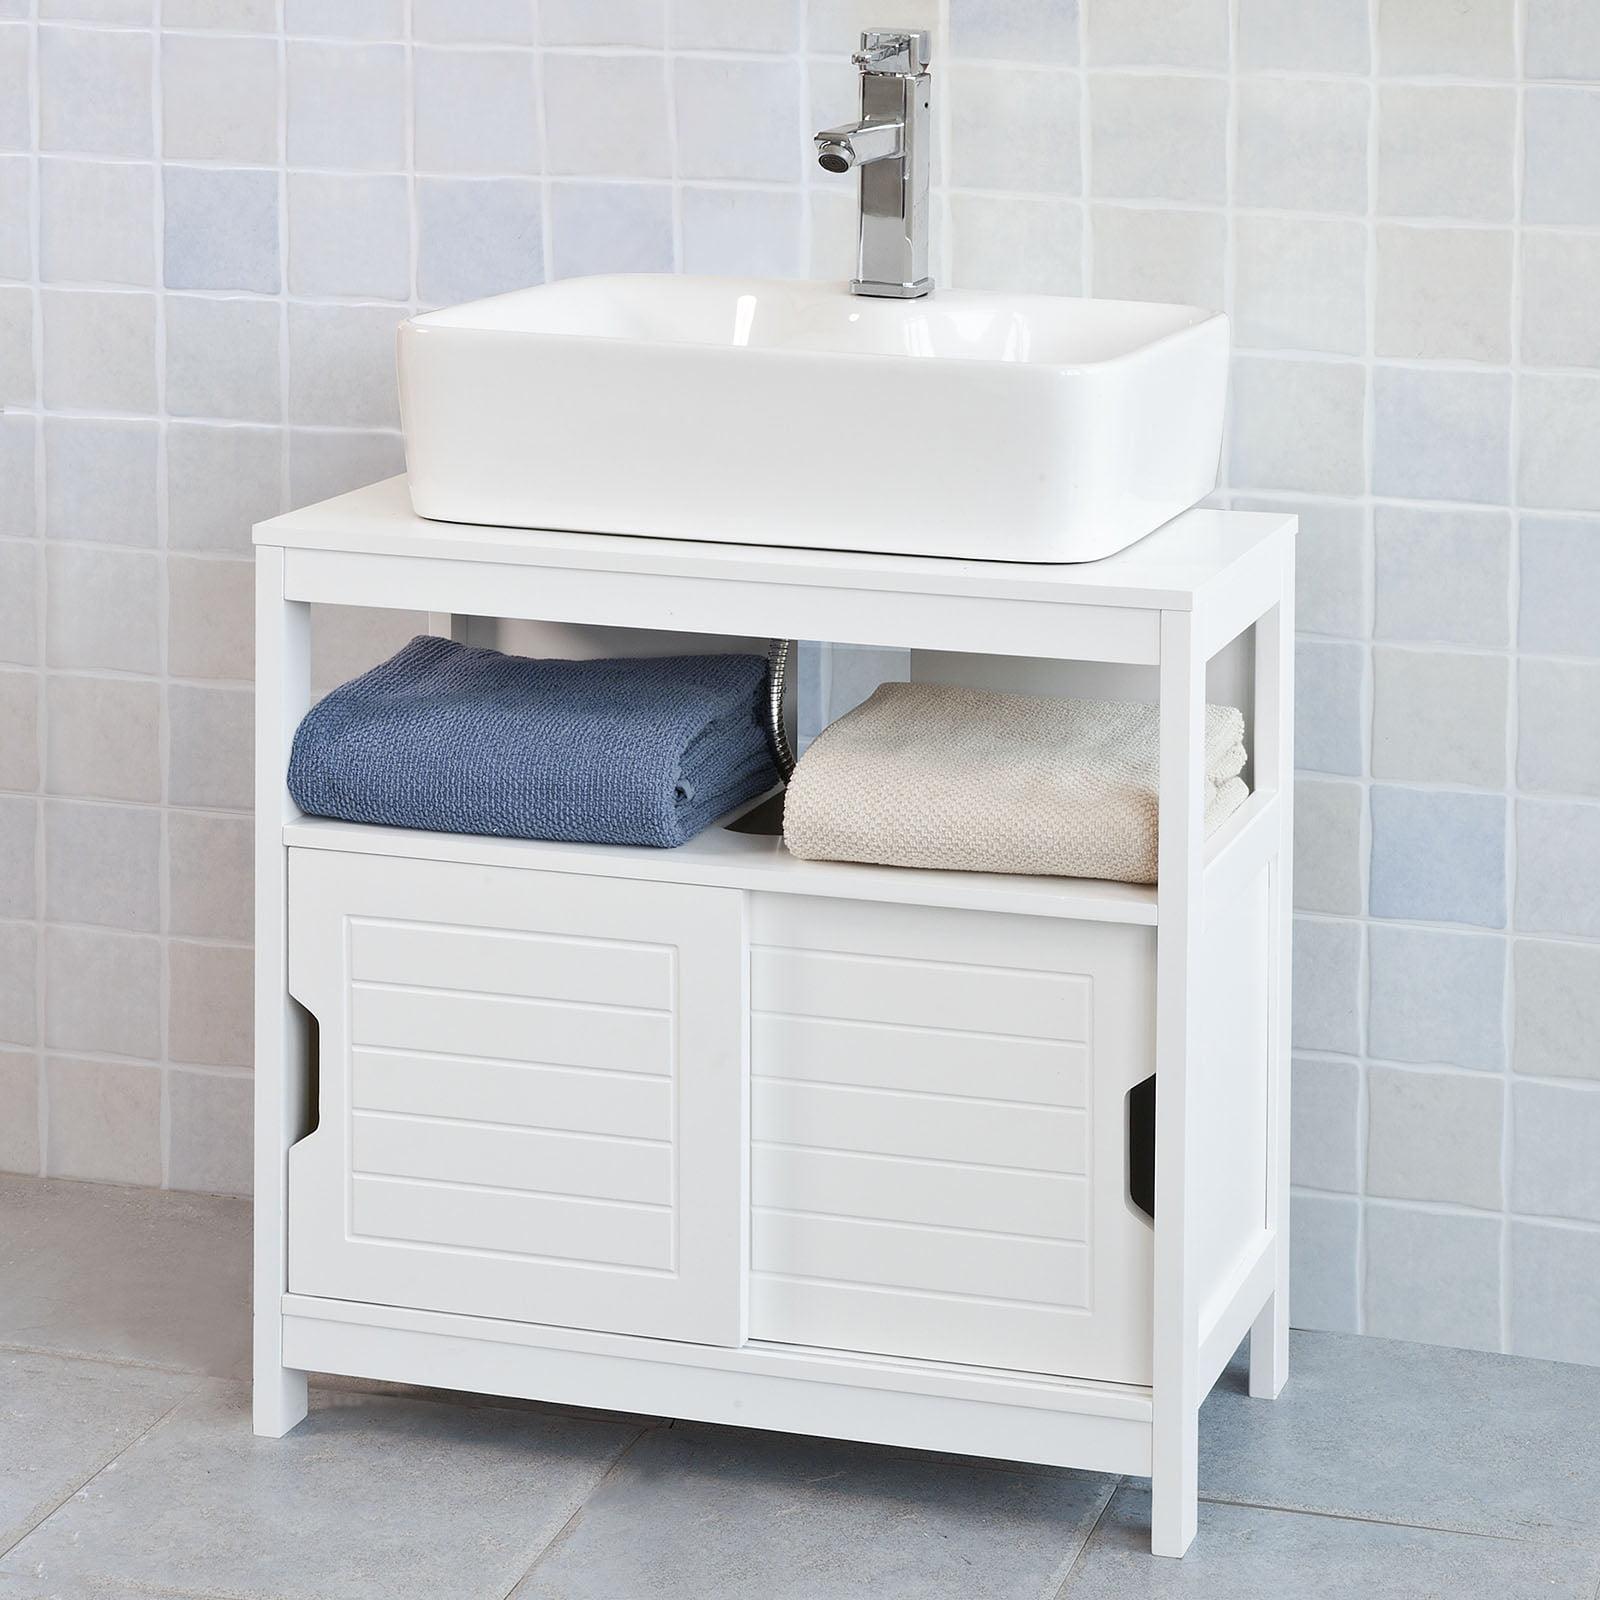 Haotian FRG128W White Under Sink Bathroom Storage Cabinet with